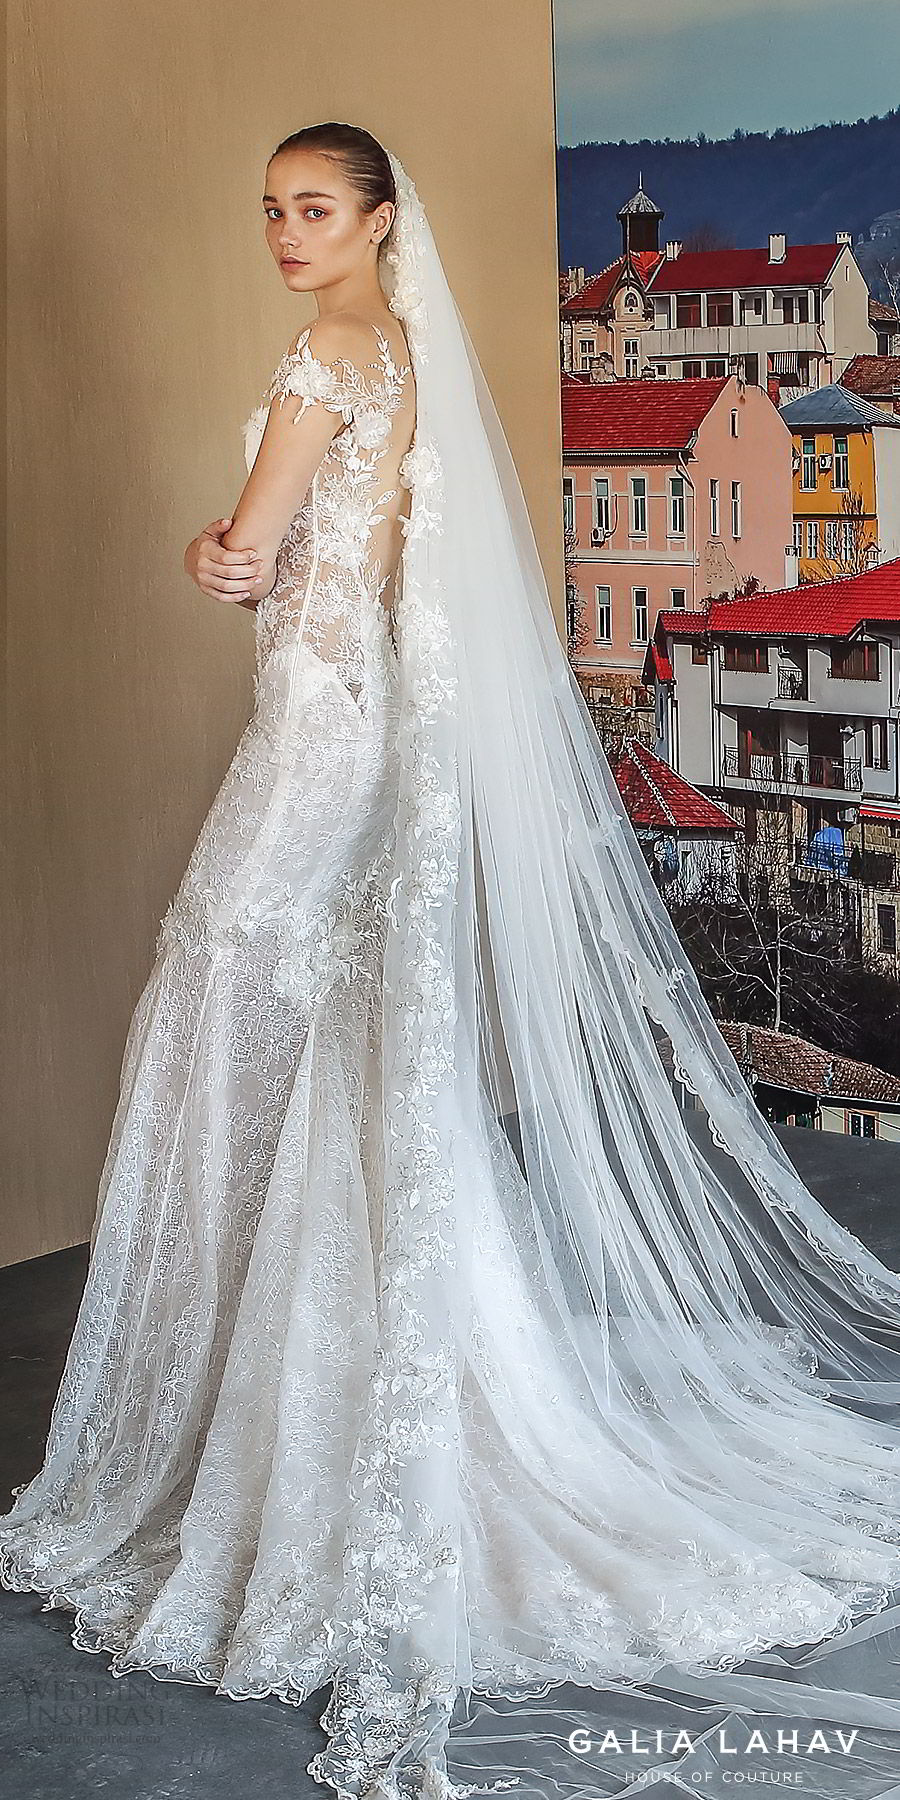 galia lahav fall 2019 bridal illusion long sleeves sweetheart neckline fit flare heavily embellished mermaid lace wedding dress open back chapel train elegant romantic veil (nissa) zbv